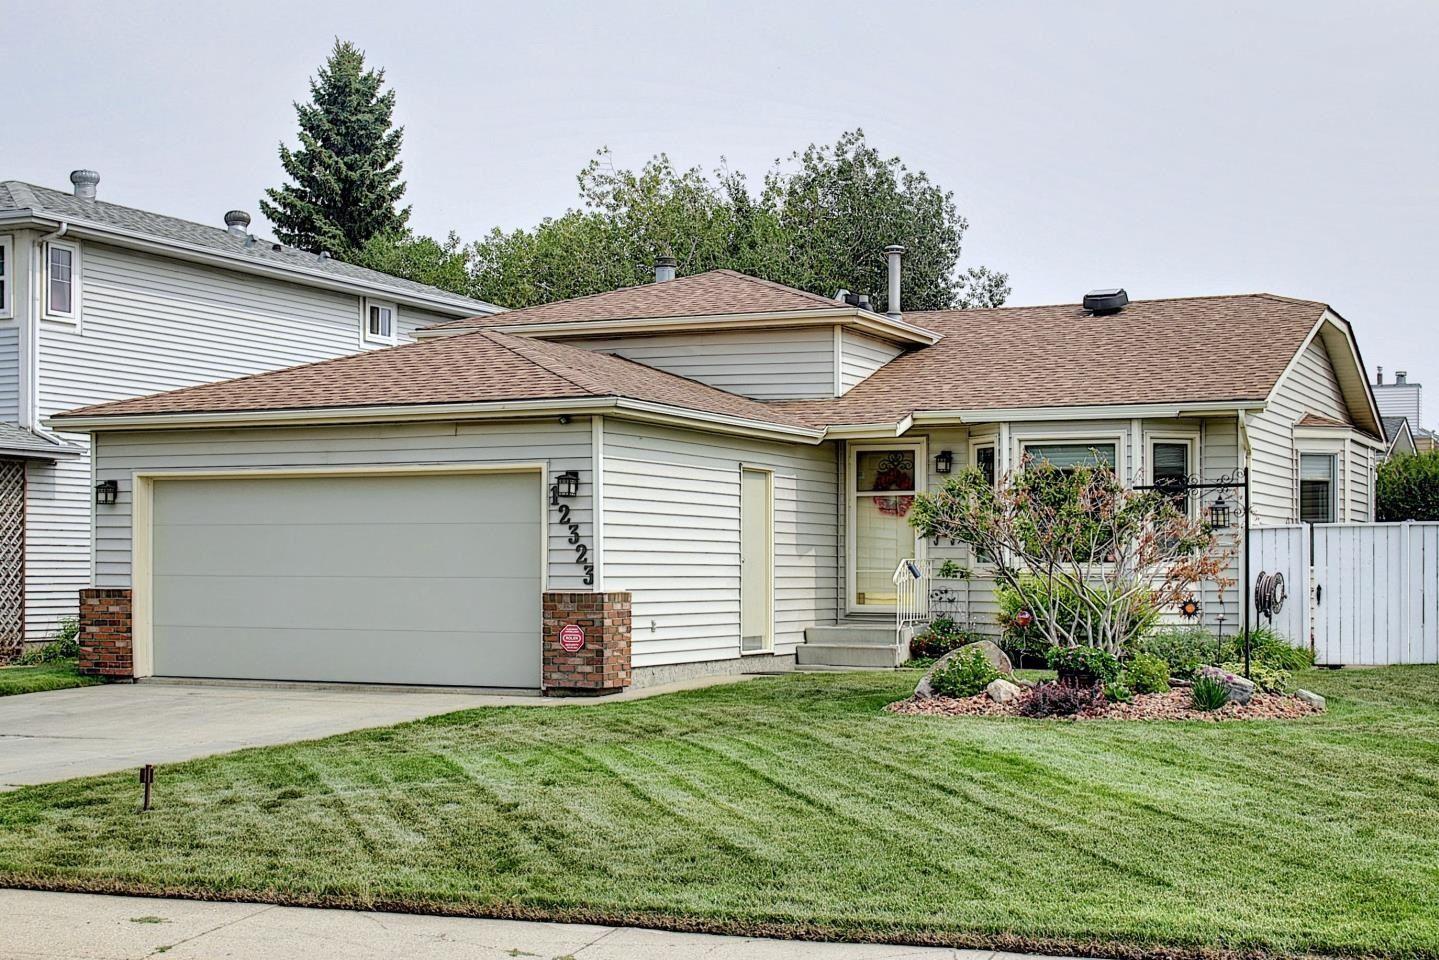 Main Photo: 12323 43 Street in Edmonton: Zone 23 House for sale : MLS®# E4258897